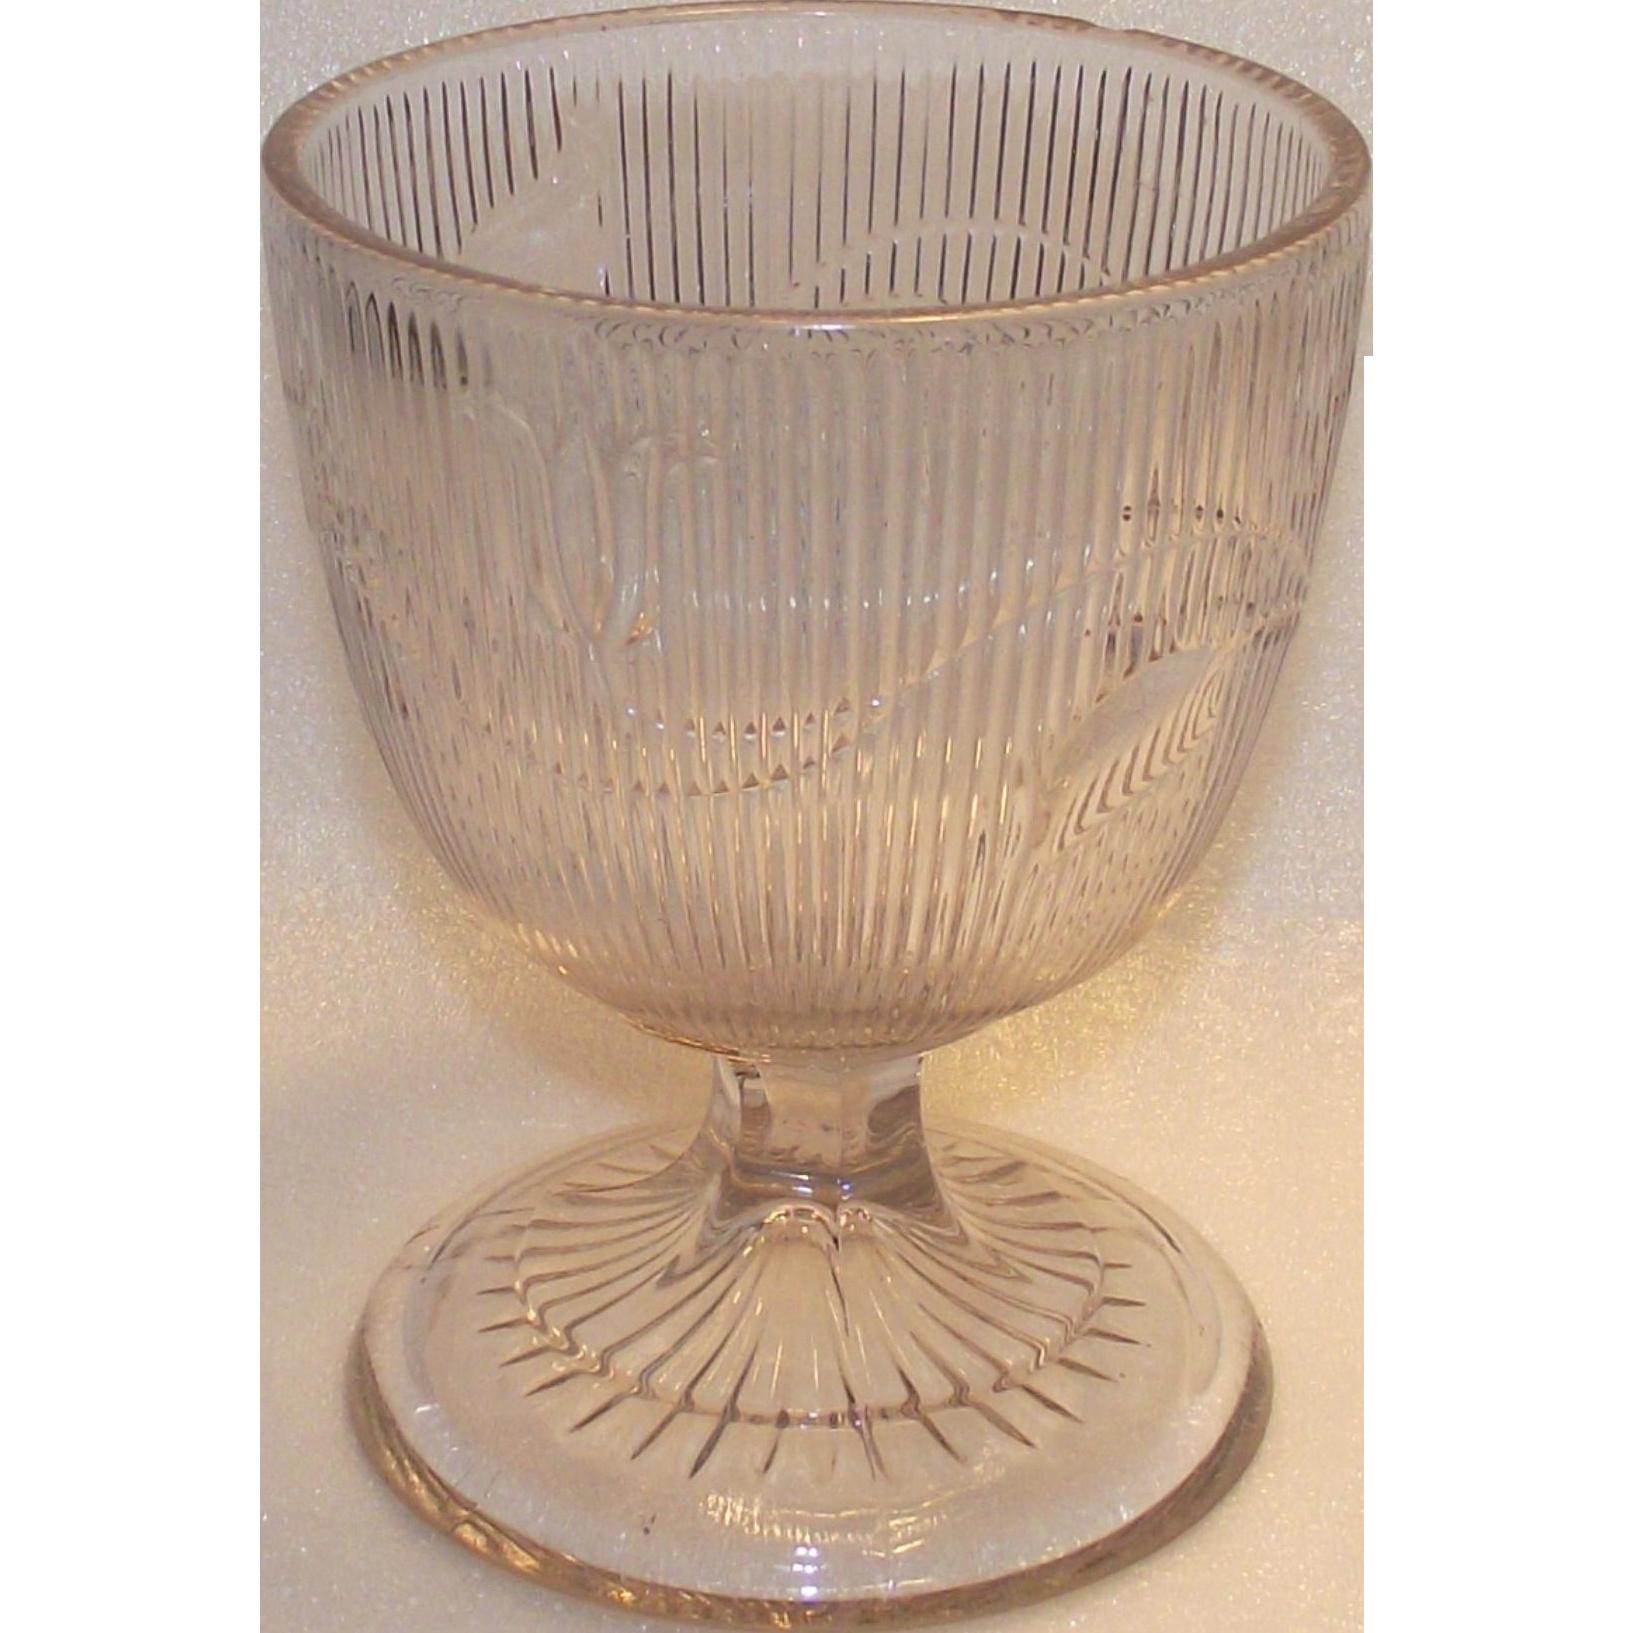 Victorian Boston and Sandwich Co  1840s Flint Glass Bellflower Large Open Sugar or Butter Milk  EAPG